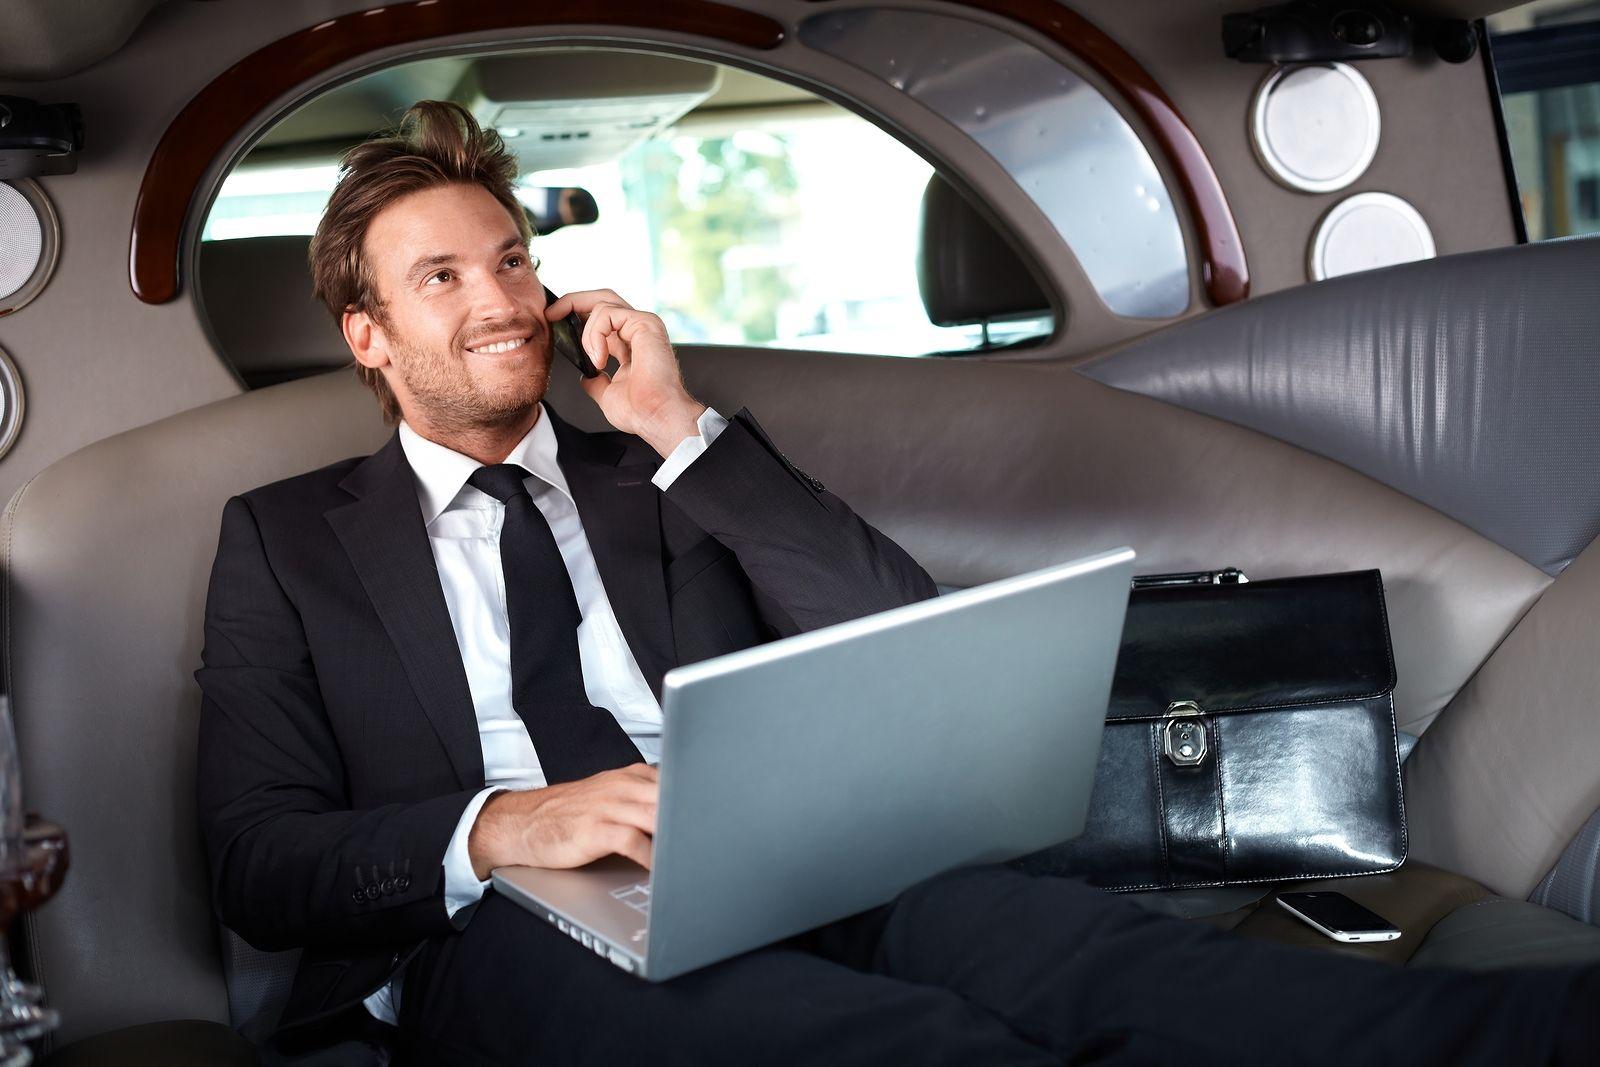 Find local rich men on MillionaireMatch Airport car